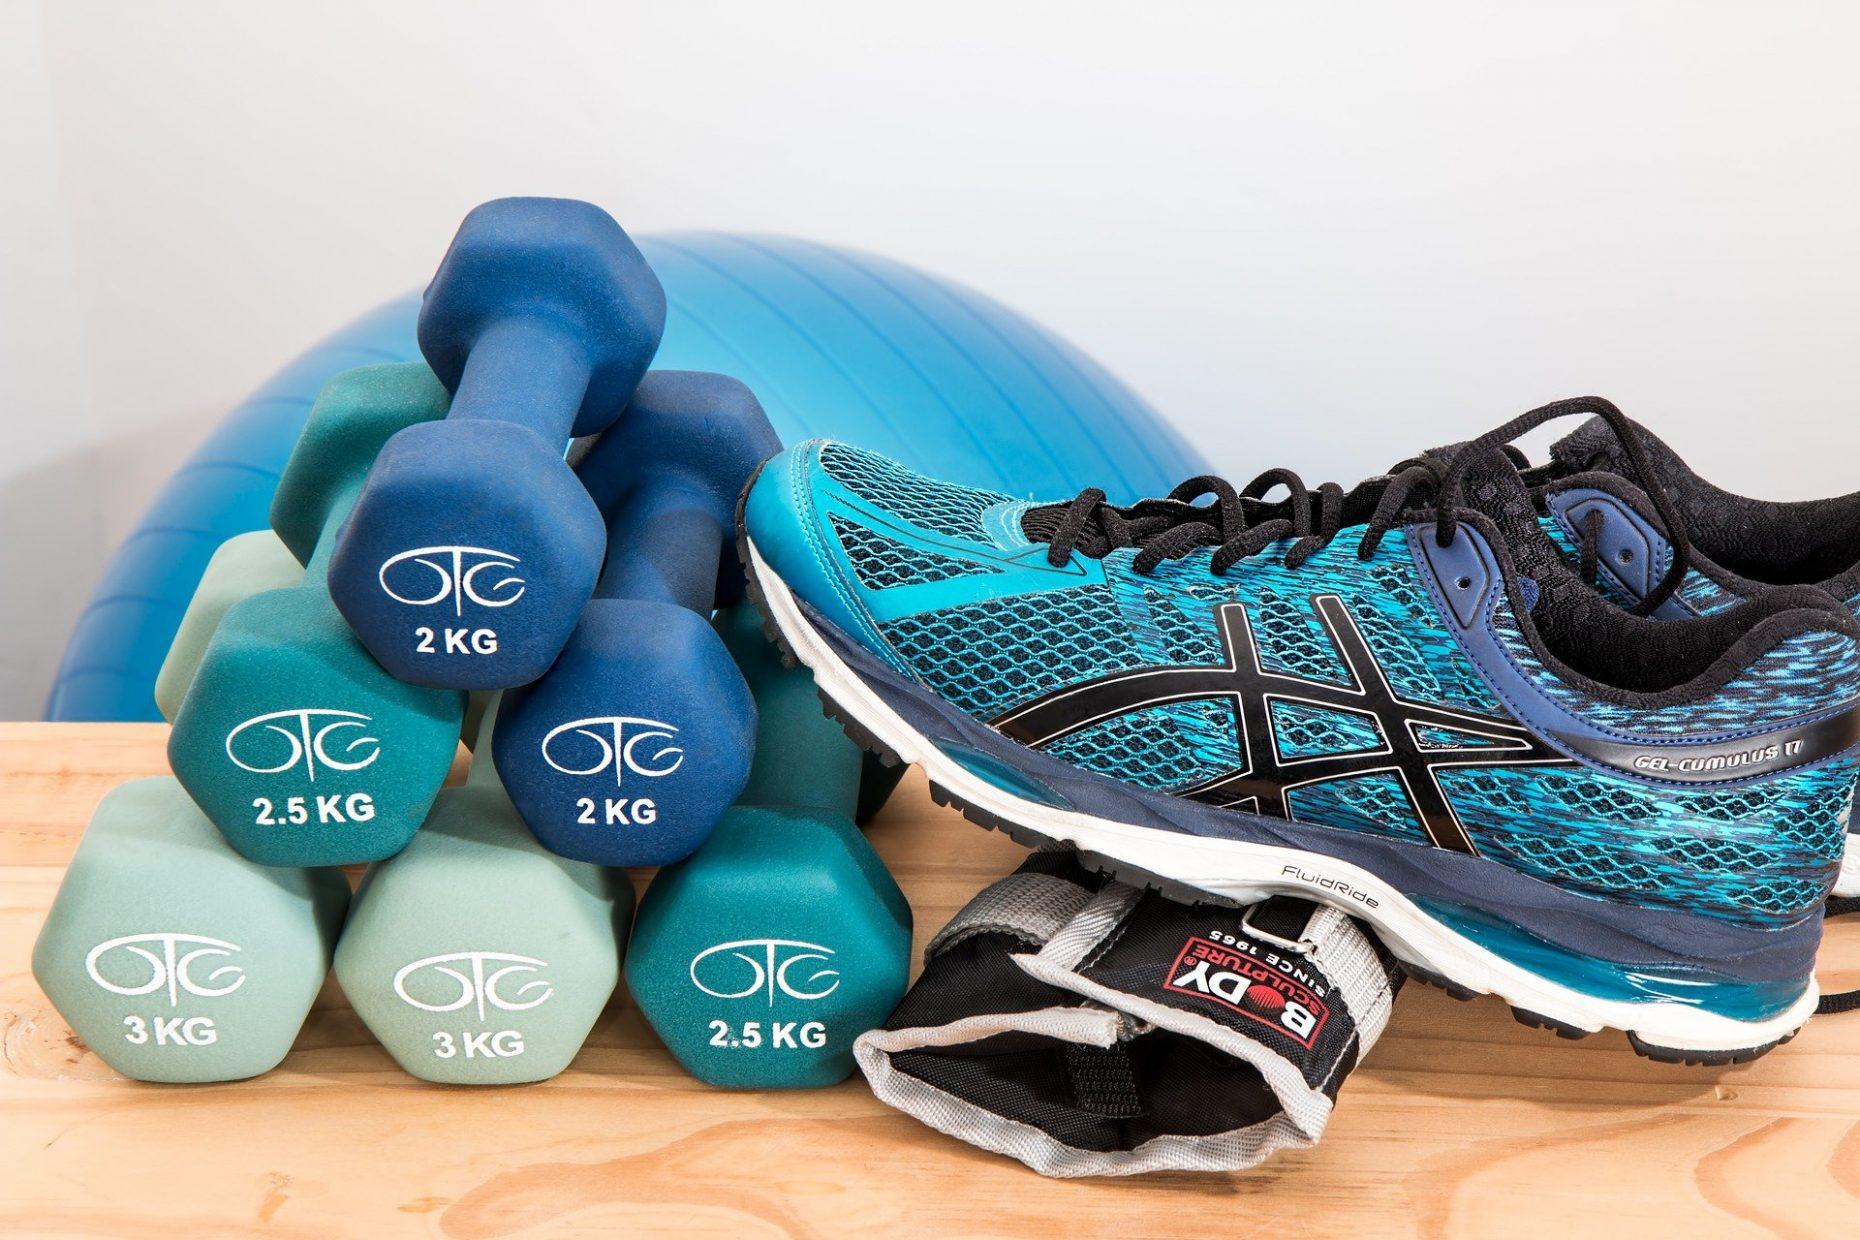 Exercises for brisk walking